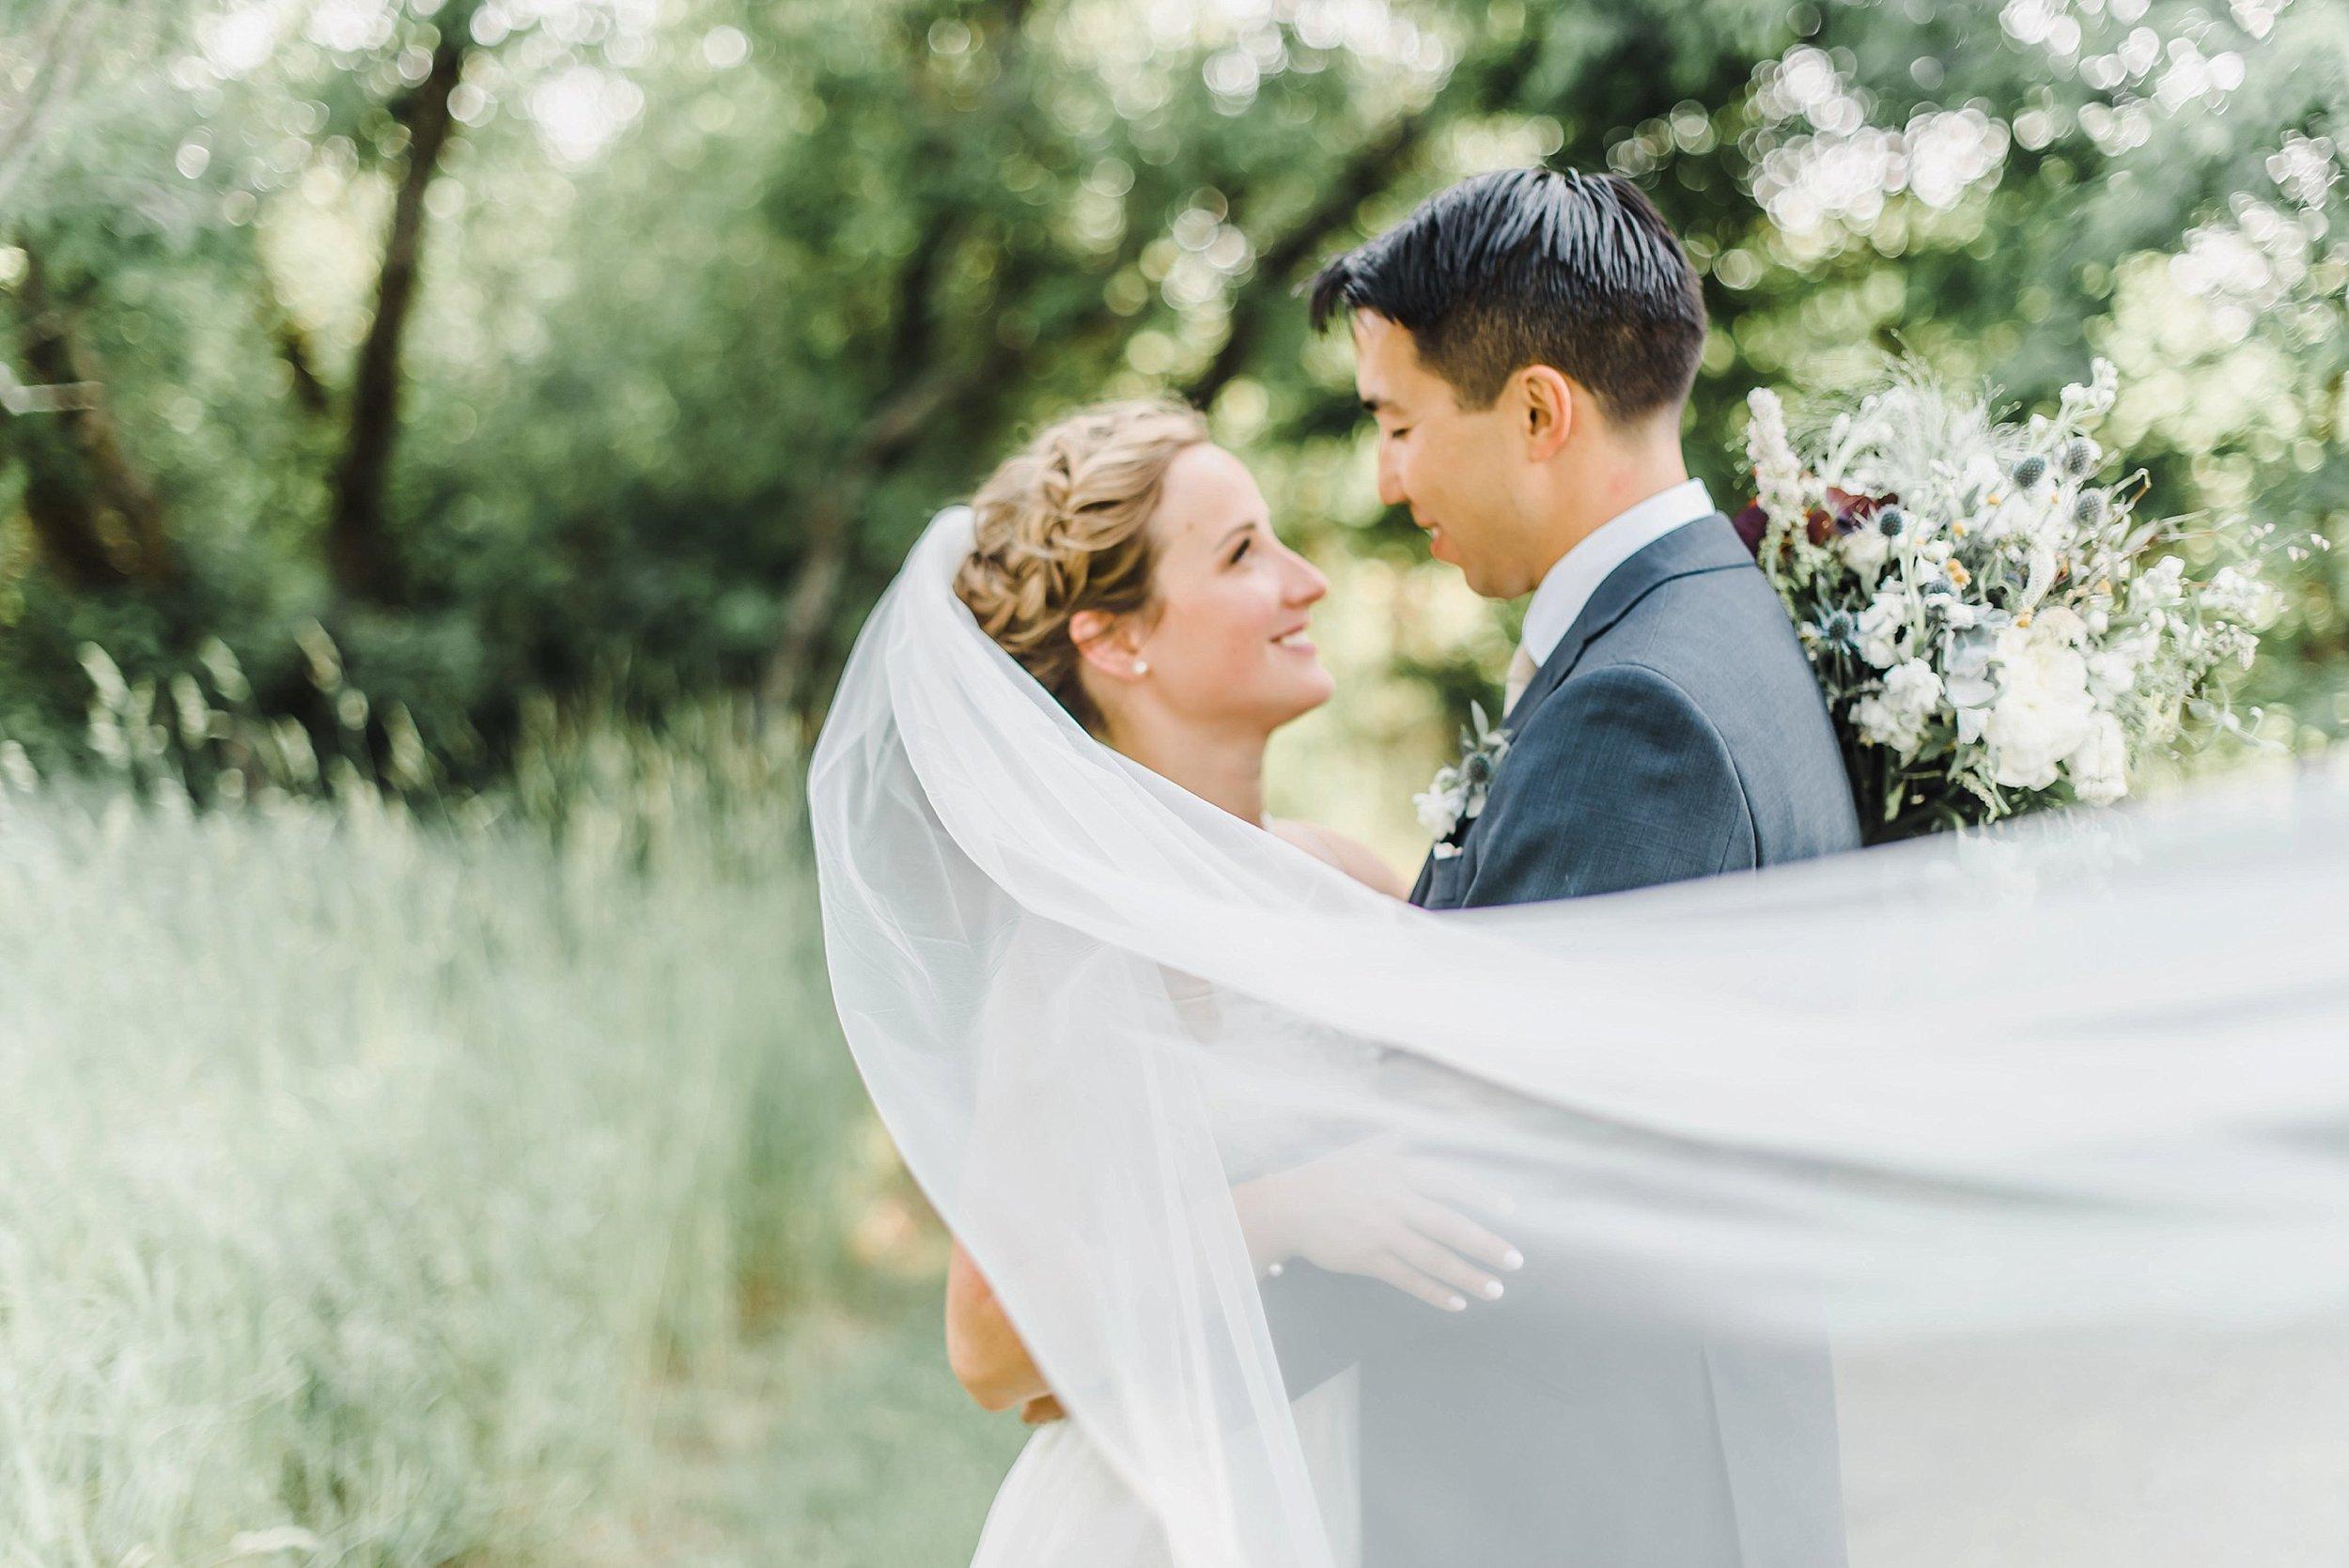 light airy indie fine art ottawa wedding photographer | Ali and Batoul Photography_0838.jpg